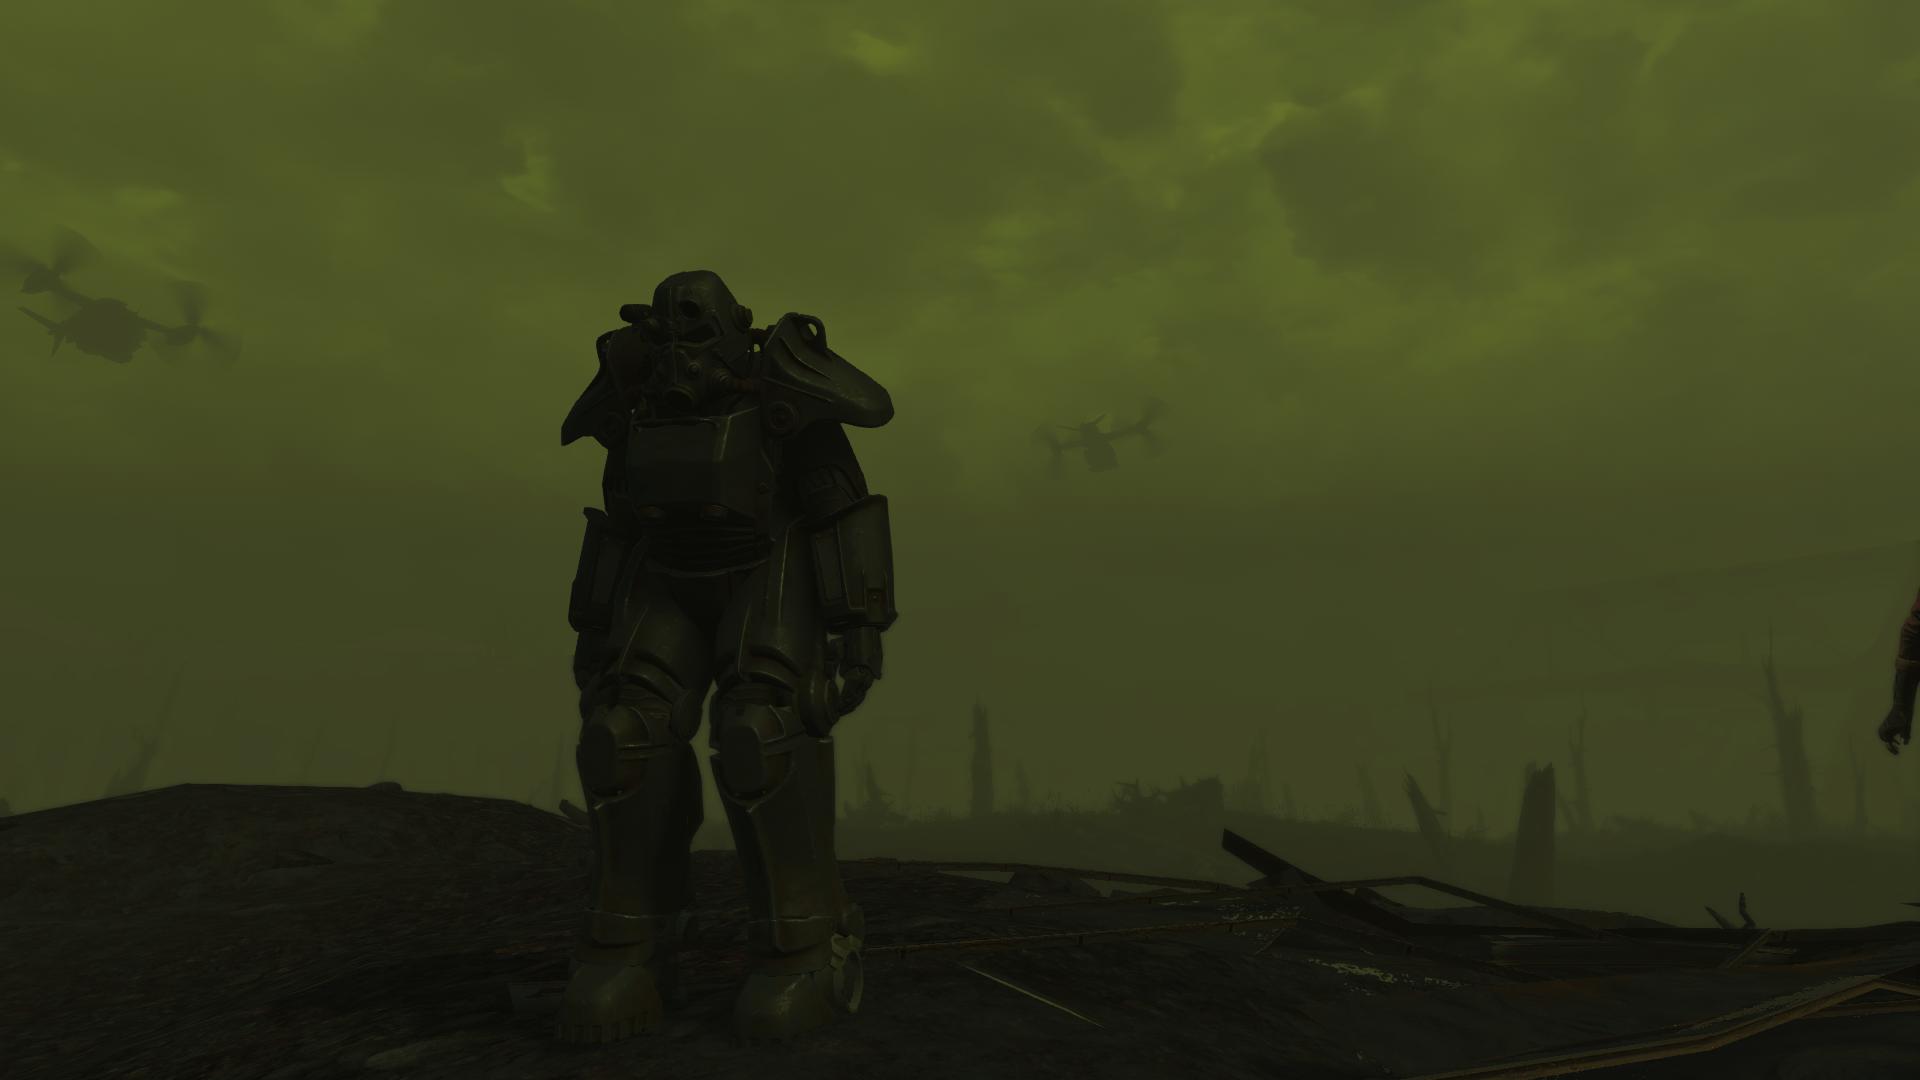 Wallpaper Fallout 4 Screen Shot Video Game Art Power Armor